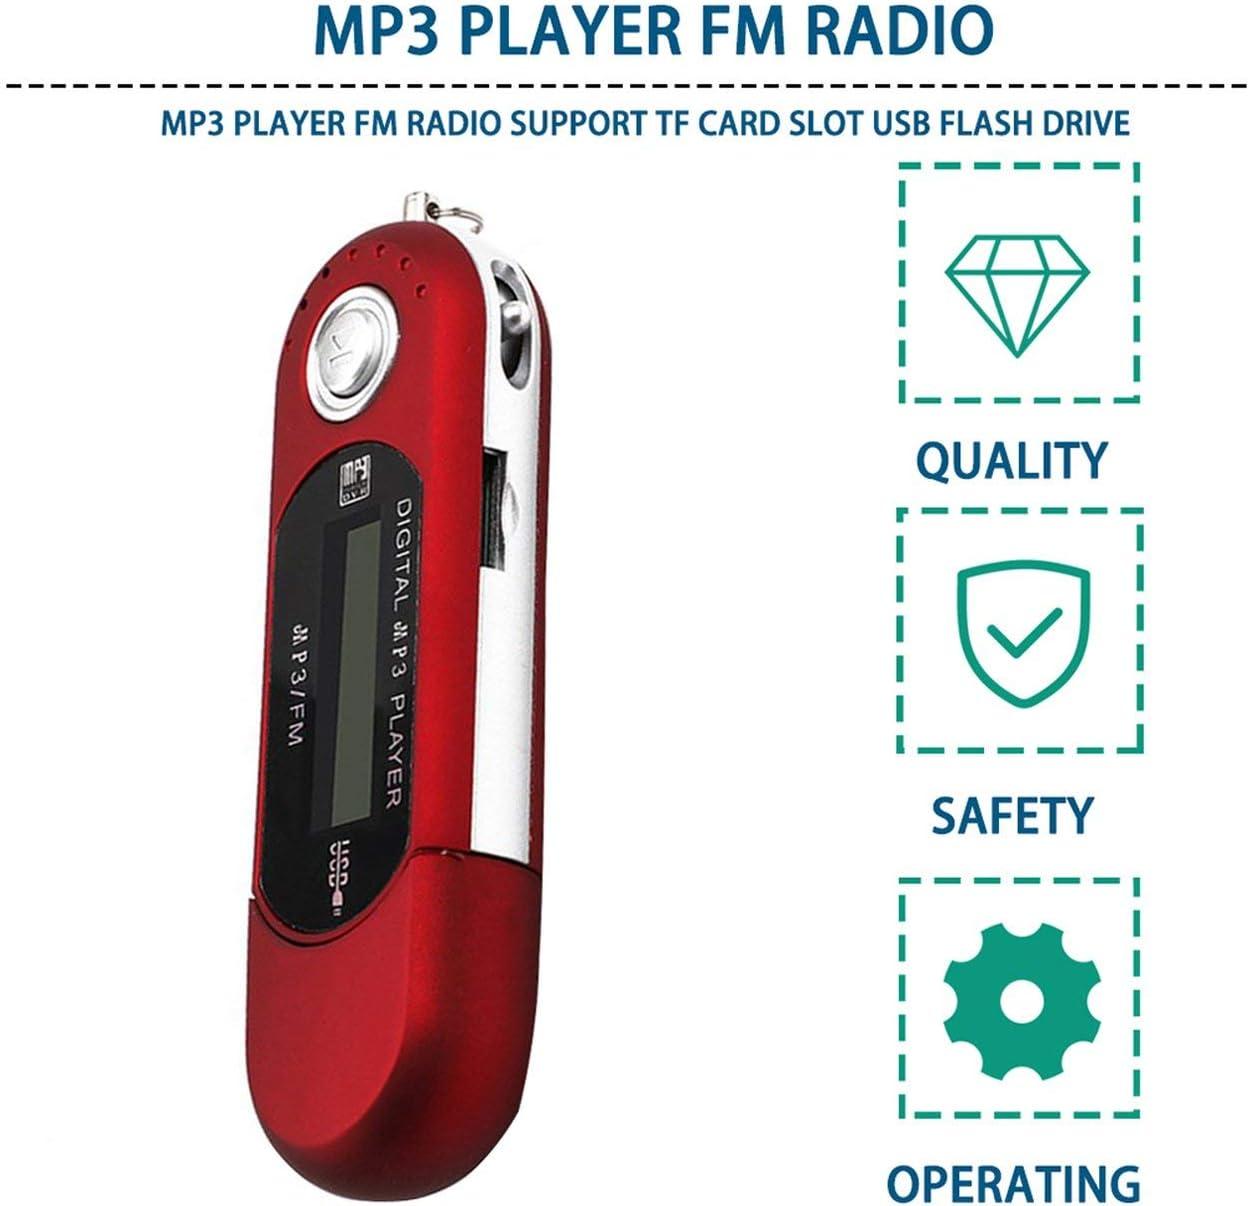 Lorenlli Digital Mini USB MP3 Music Player FM Radio Function With TF Card Slot LCD Screen Portable USB Flash Drive With Earphone